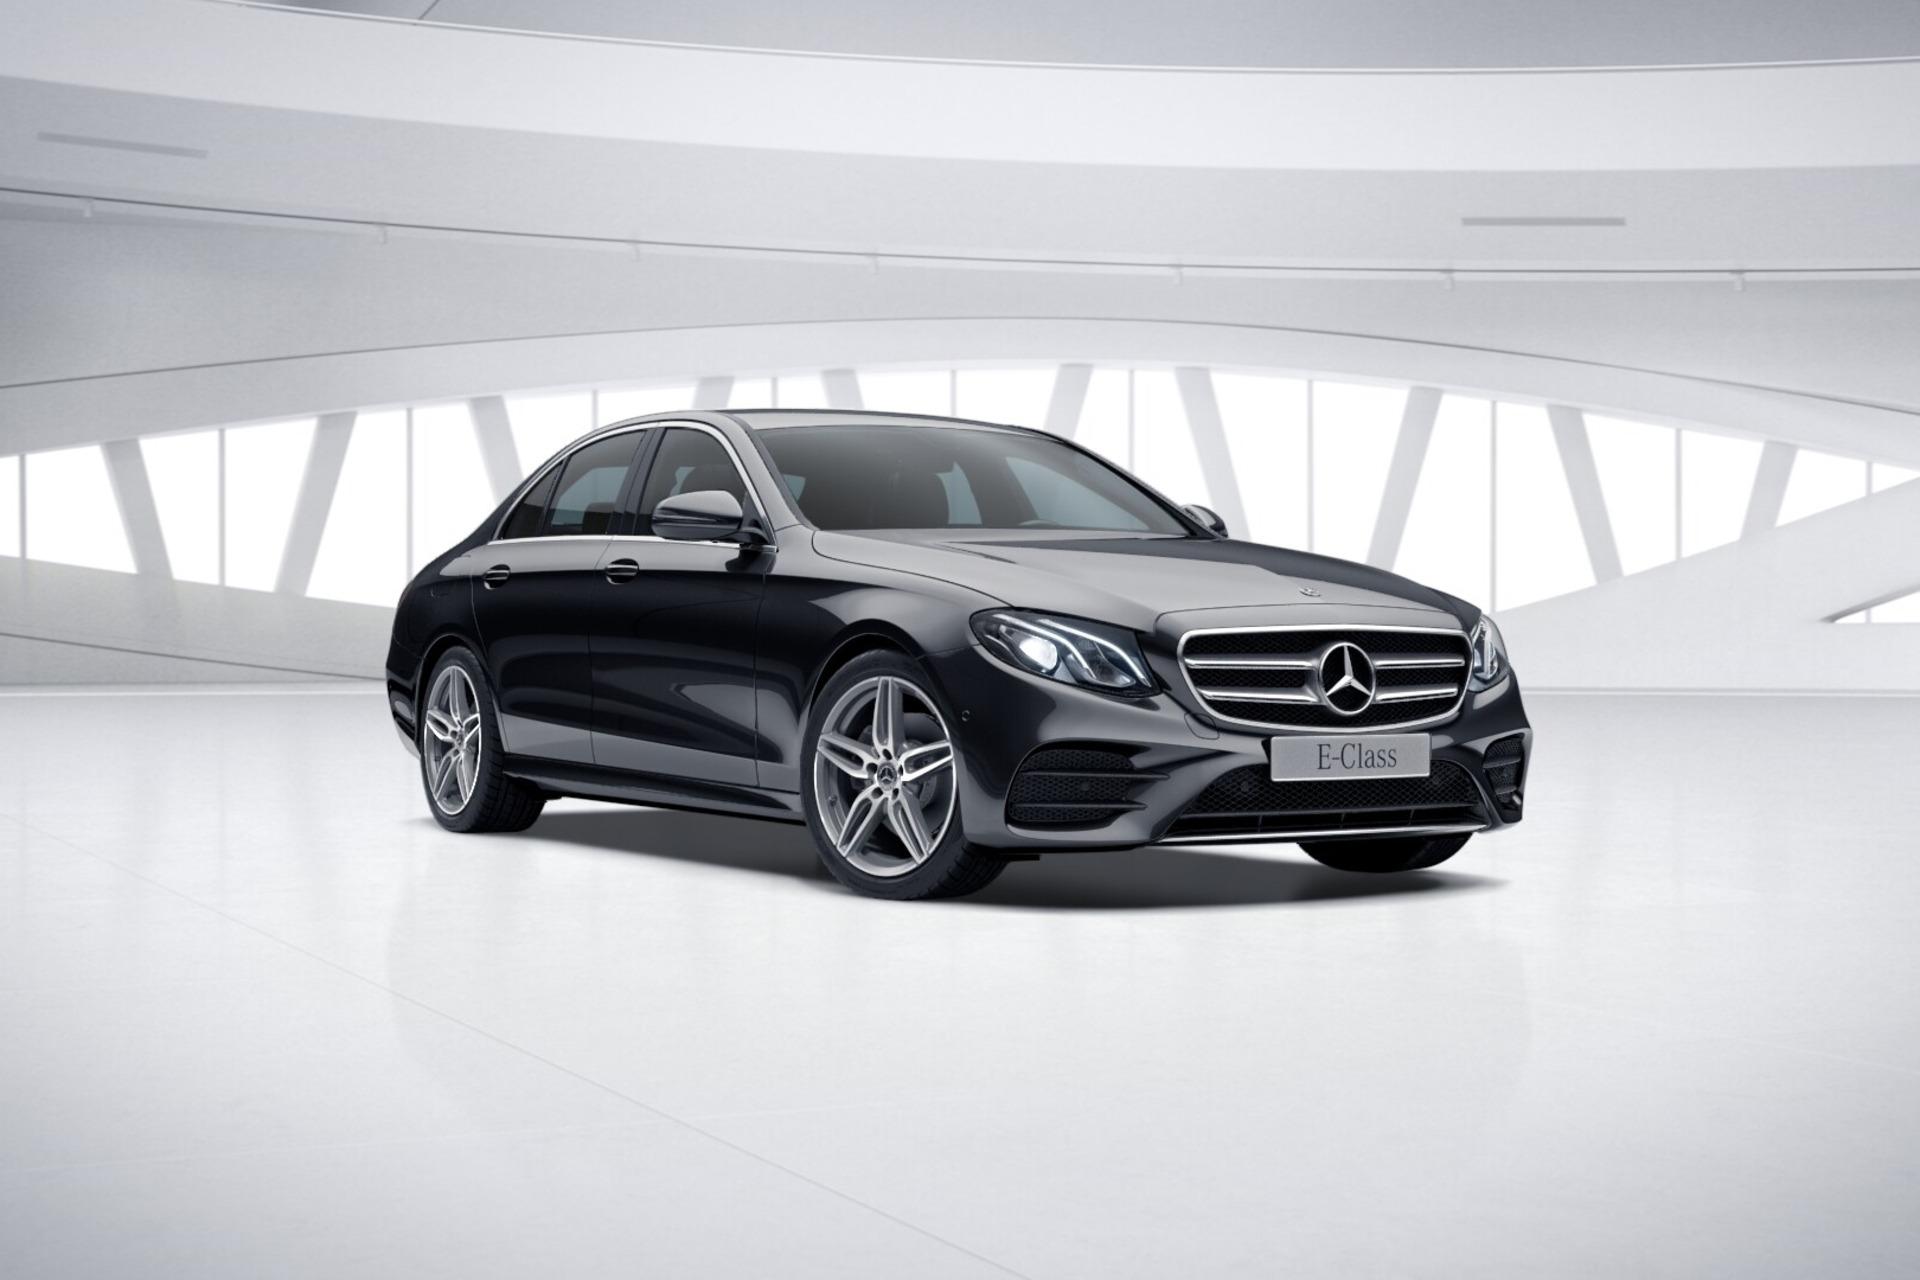 Mercedes-Benz E-Class Limousine 952611369